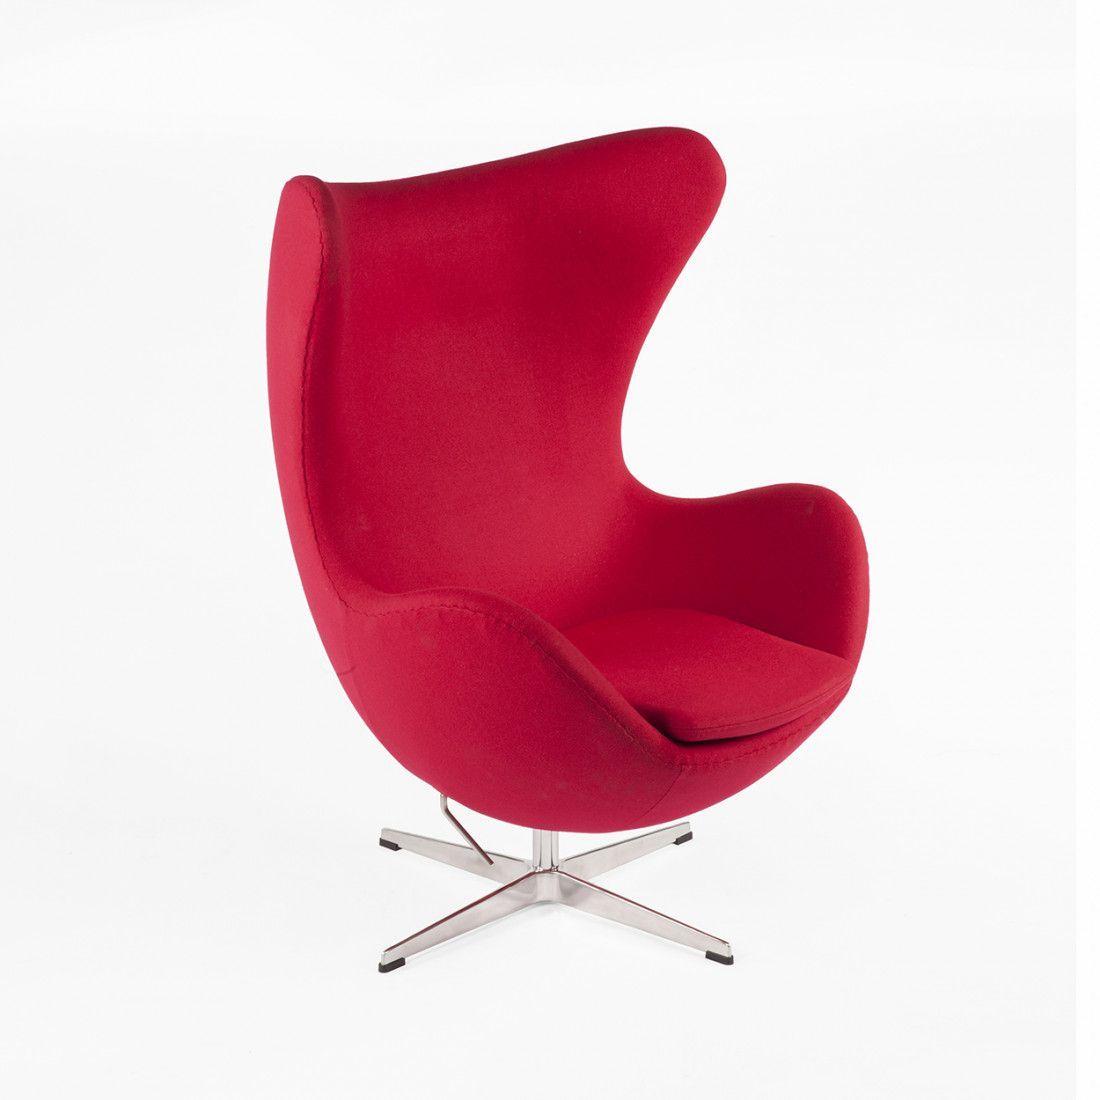 Mid Century Modern Reproduction Egg Chair   Dark Red Inspired By Arne  Jacobsen #EggChair